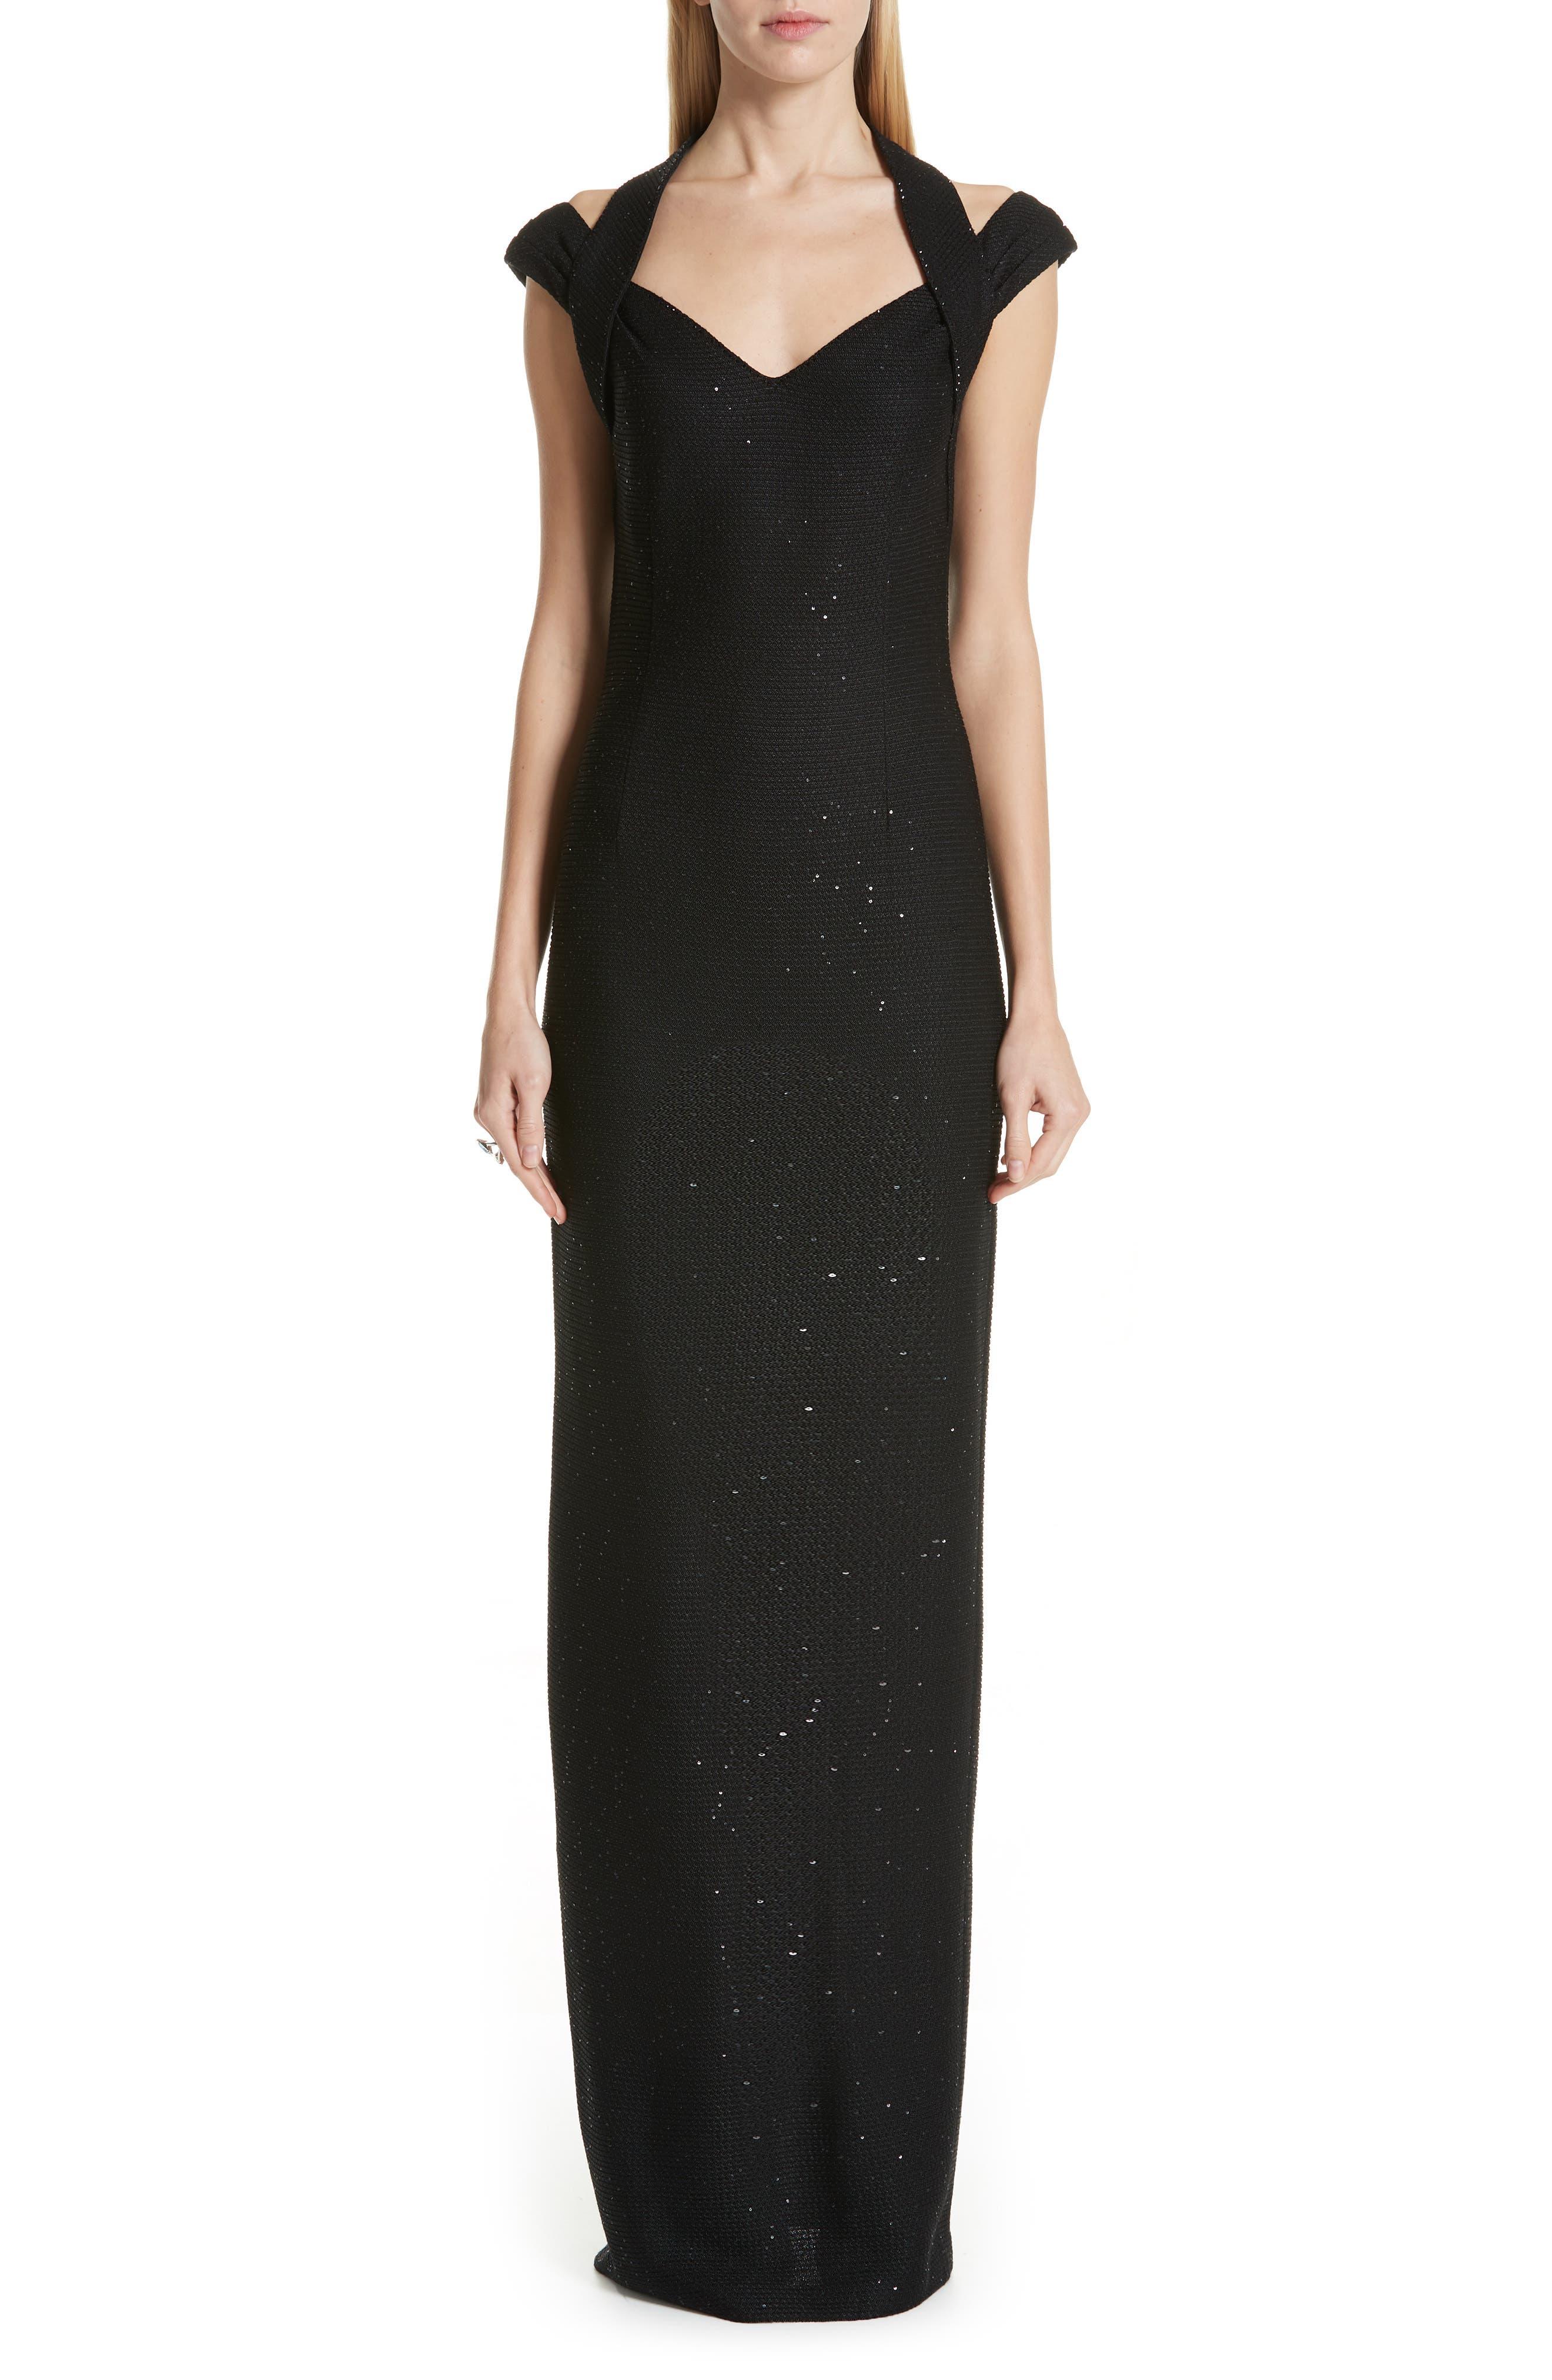 St. John Collection Links Sequin Knit Halter Gown, Black